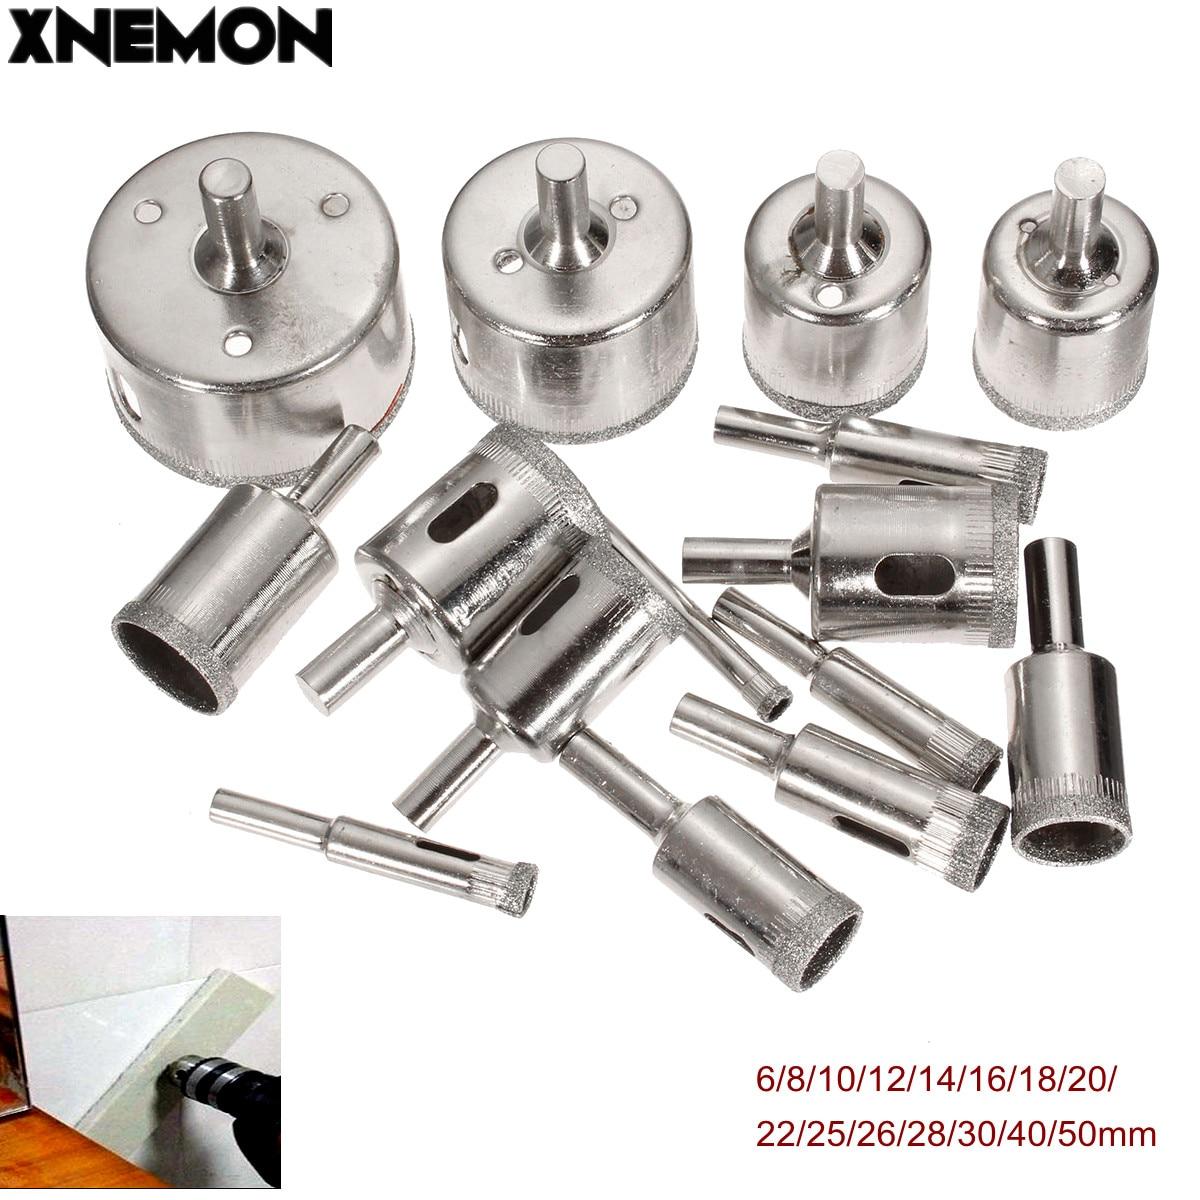 XNEMON 15Pcs 6mm-50mm Diamond Holesaw Drill Bit Tool for Ceramic Porcelain Glass 6/8/10/12/14/16/18/20/22/25/26/28/30/40/50m diamond tools for granite